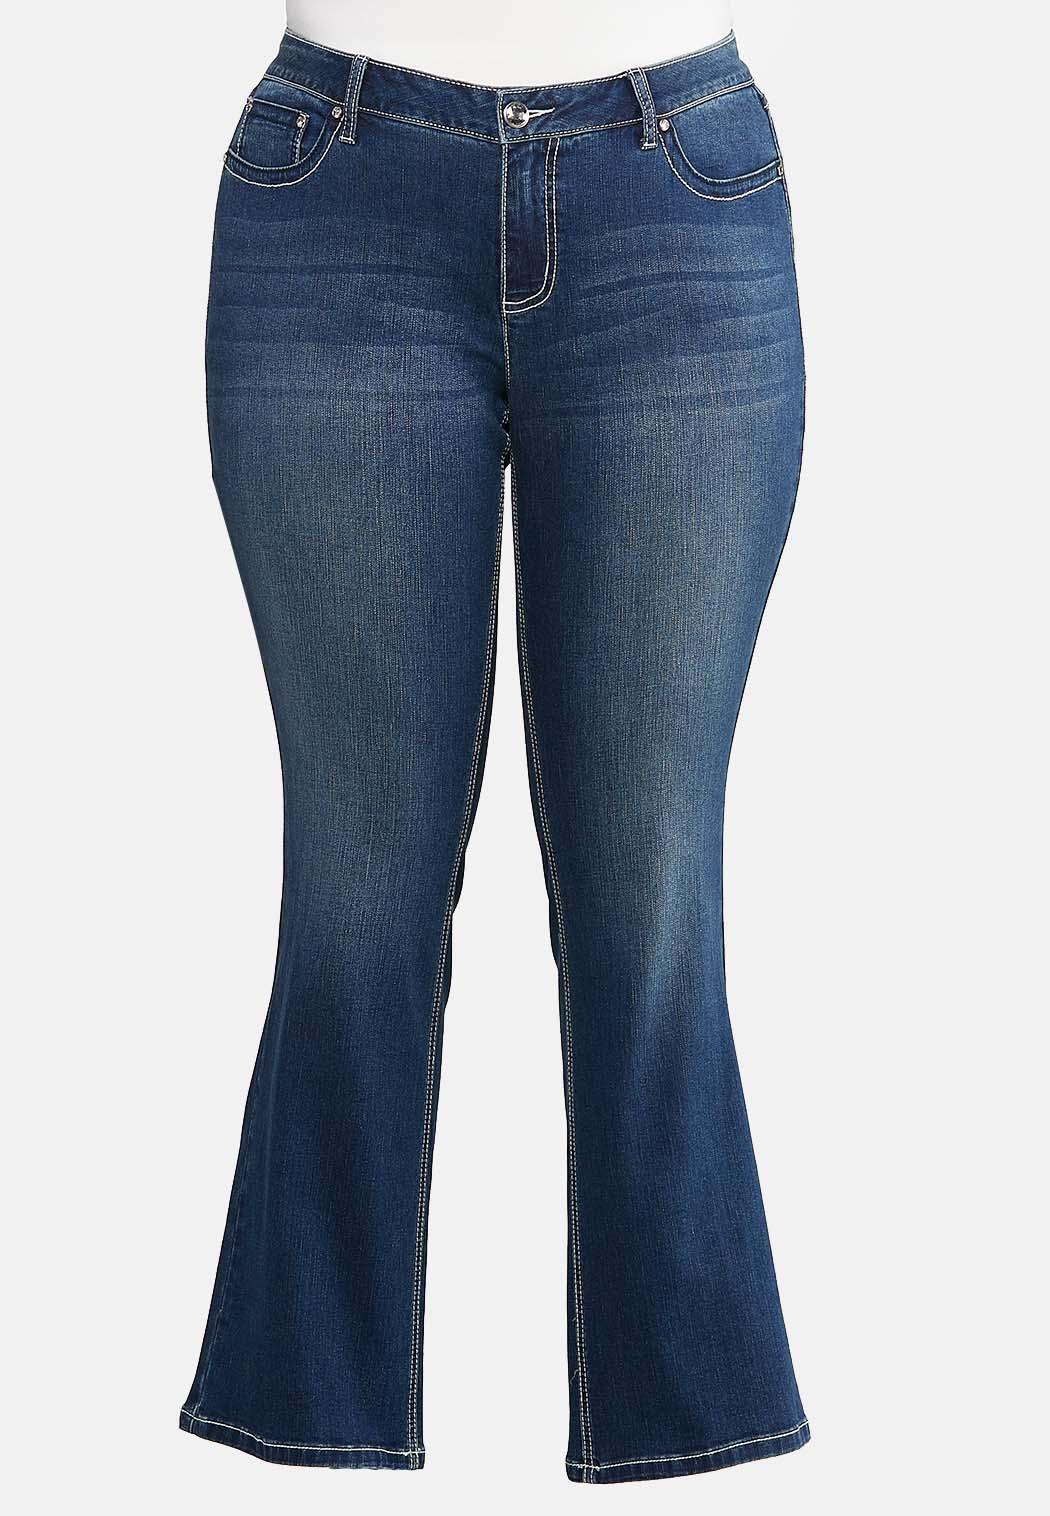 Plus Size Bling Cross Pocket Jeans (Item #43992652)